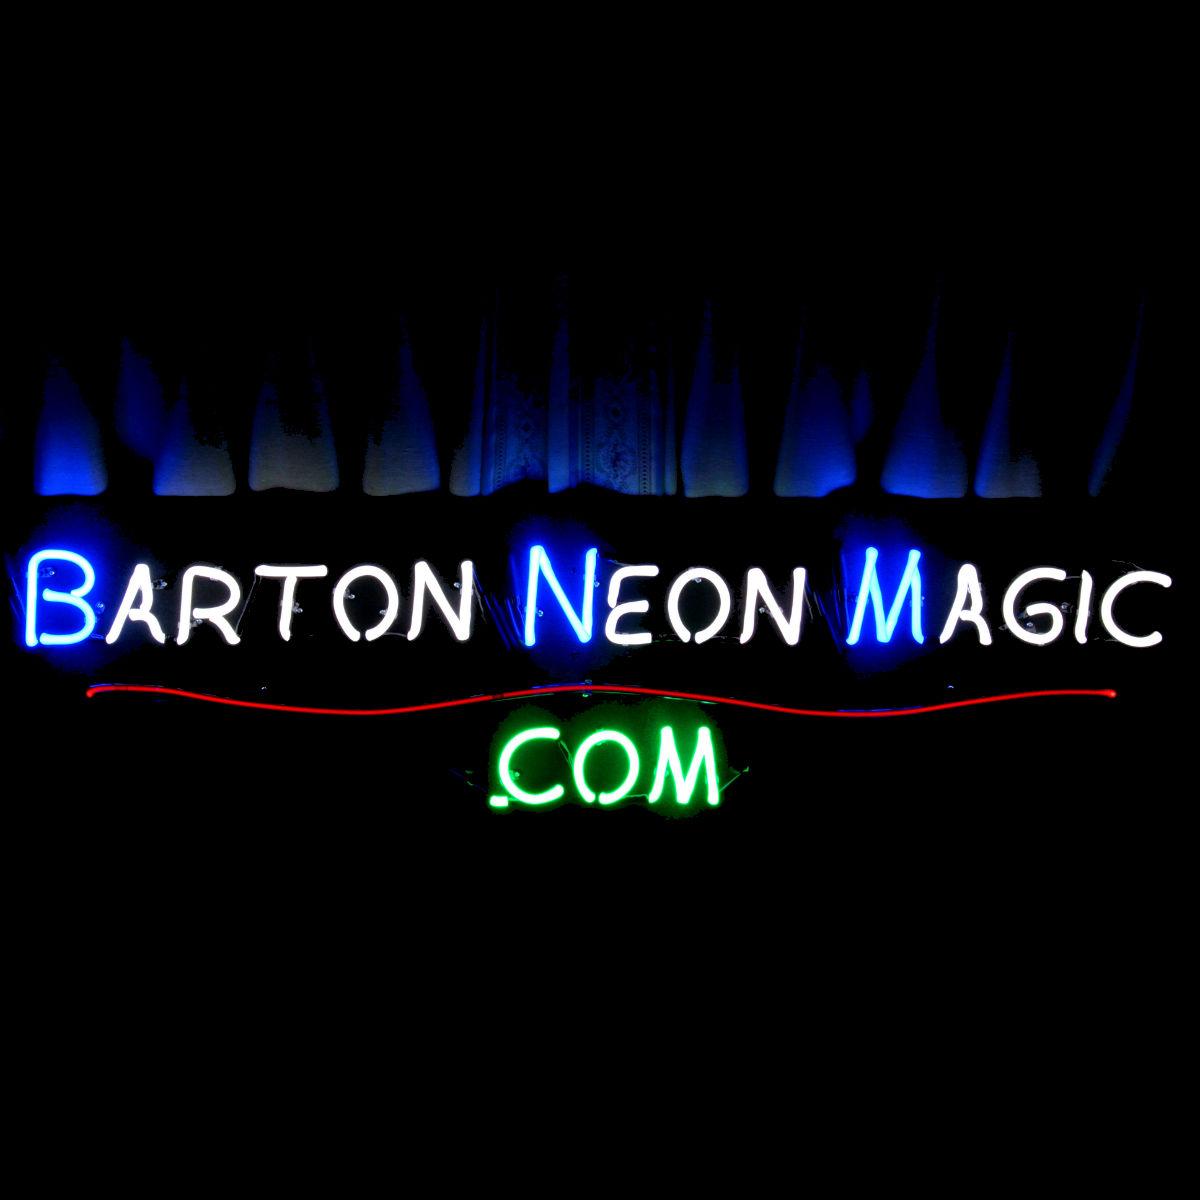 Designer Neon Light Sculptures by John Barton - BartonNeonMagic.com